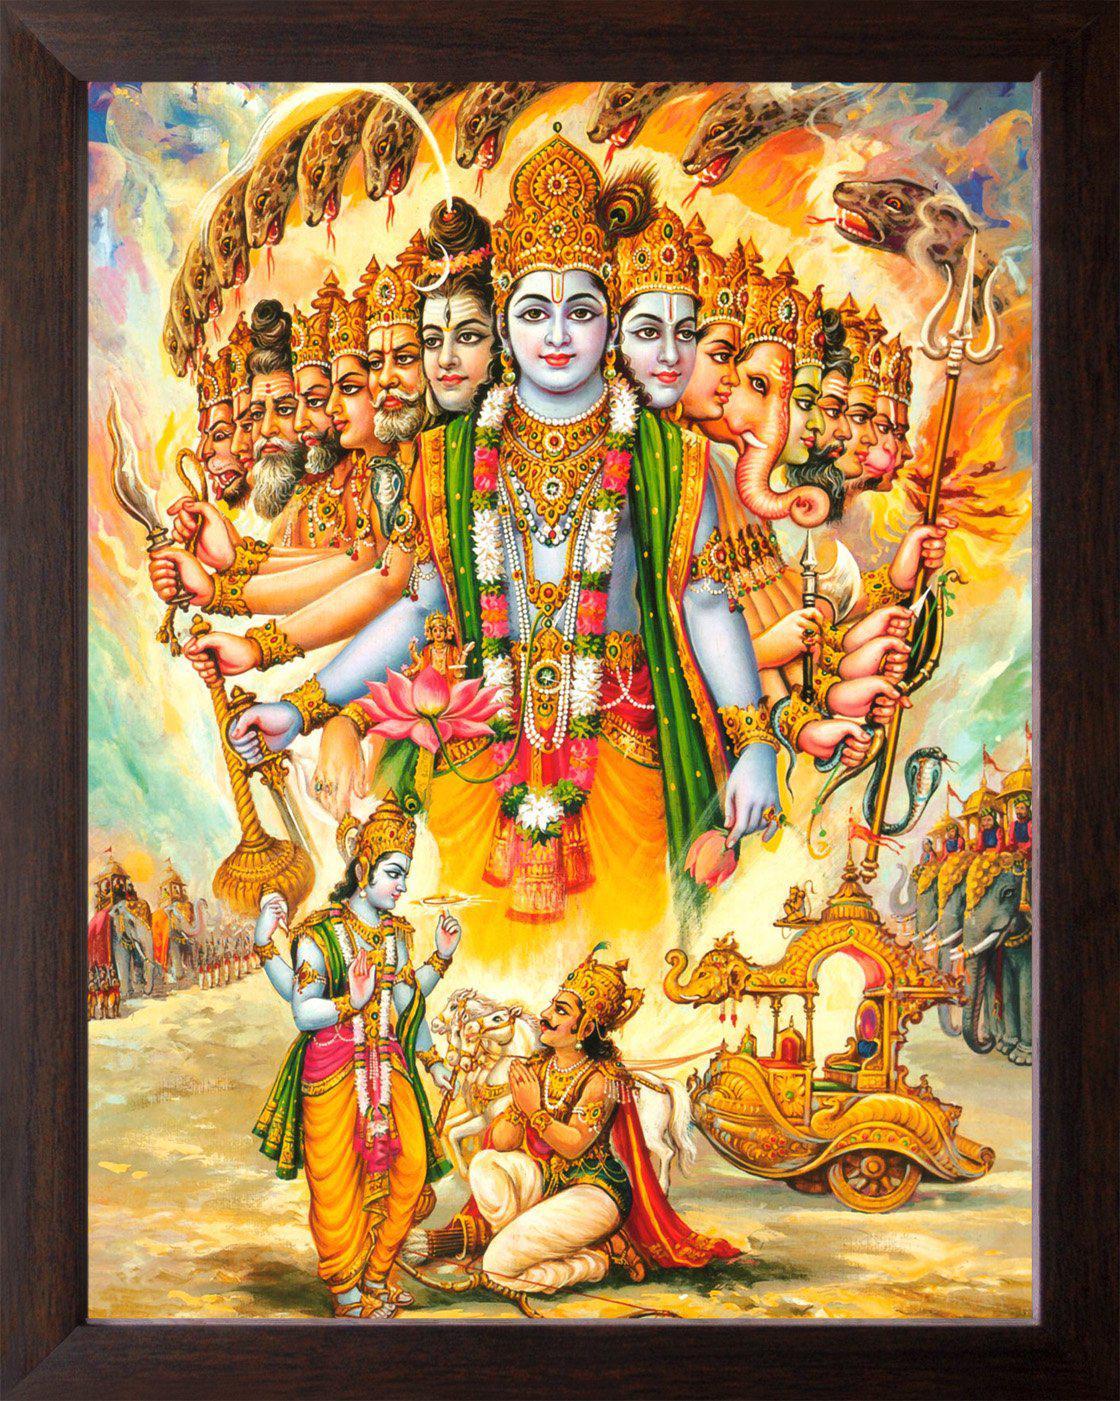 God Hd Wallpapers Free Wallpaper Downloads God Hd Desktop - Lord Krishna Virat Roop - HD Wallpaper